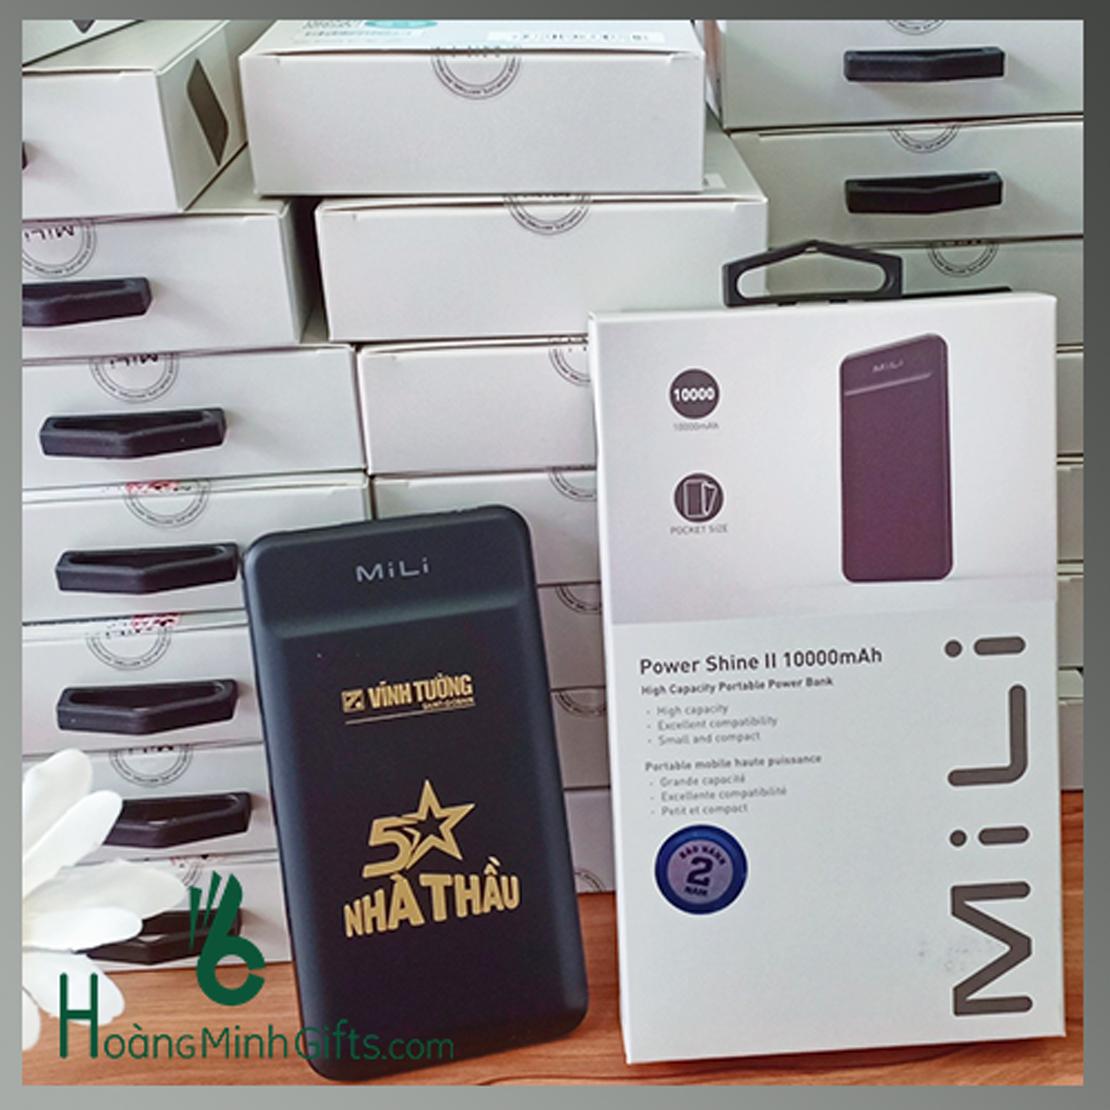 pin-sac-du-phong-mili-power-shine-ii-hbm90-kh-vinh-tuong